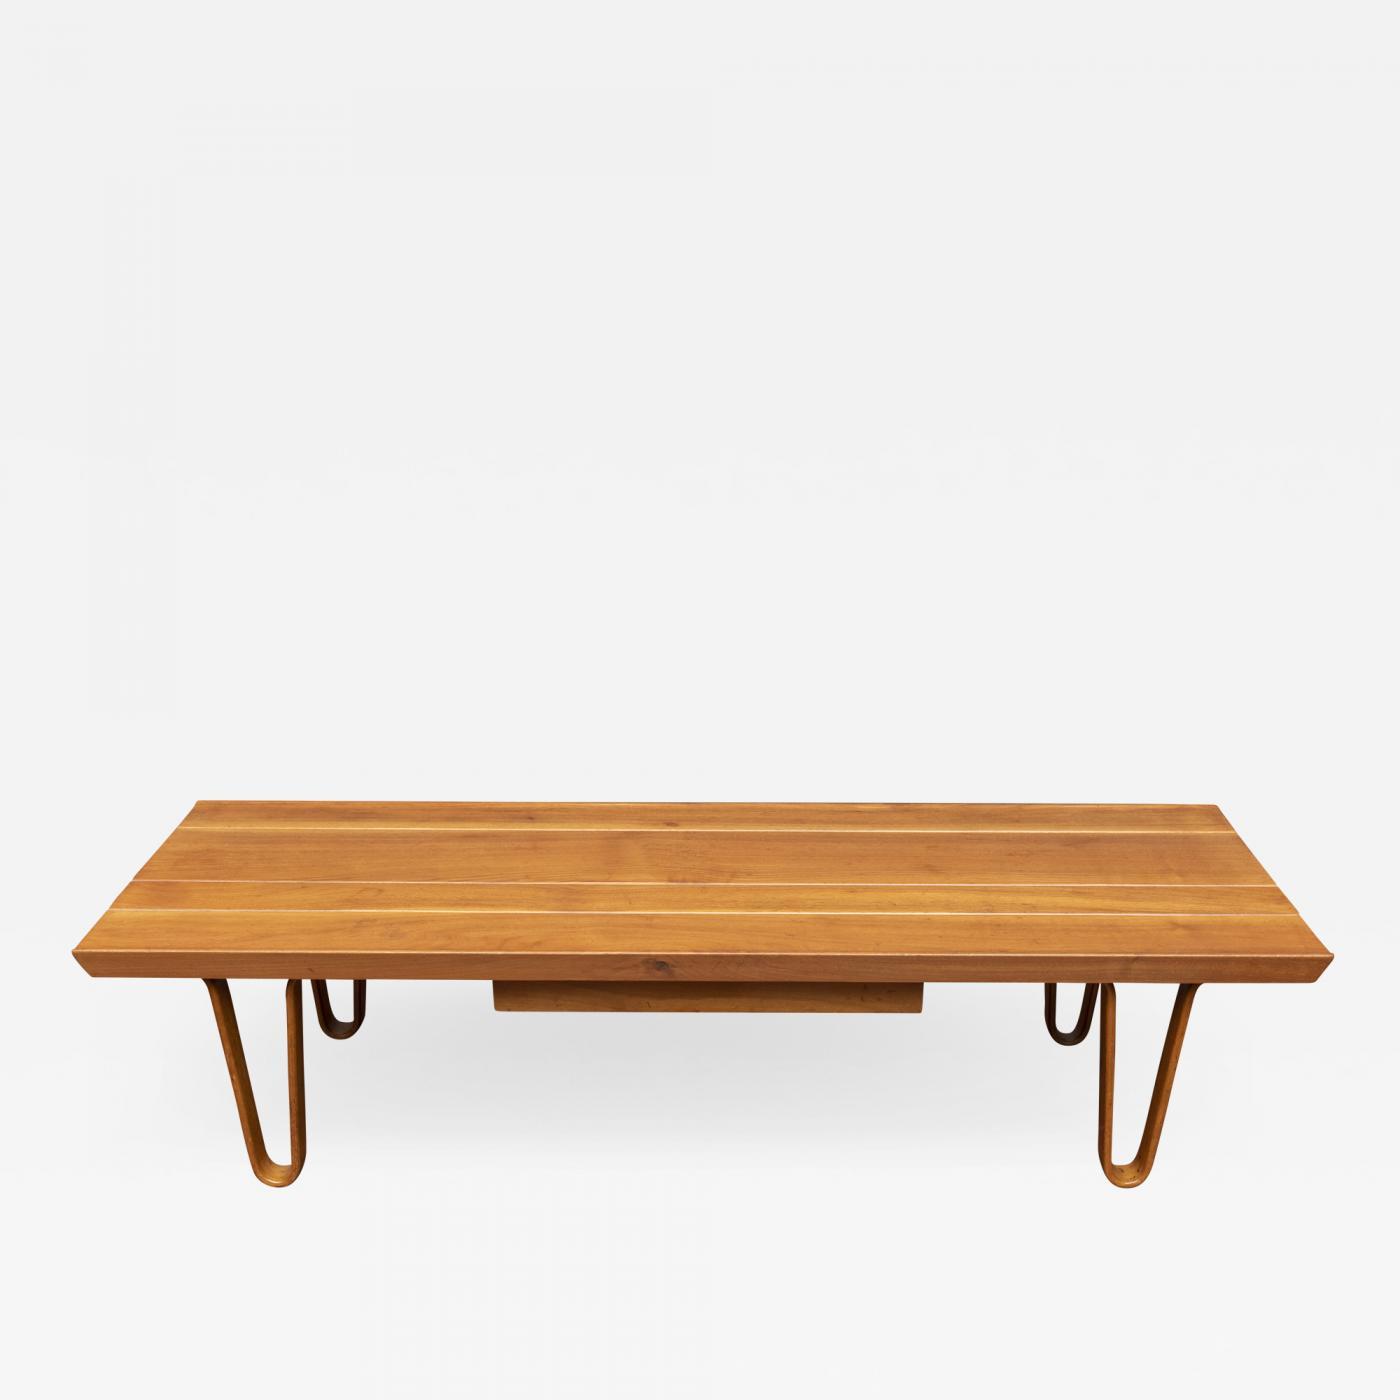 a31190f0f53f Edward Wormley Long John Bench Coffee Table for Dunbar